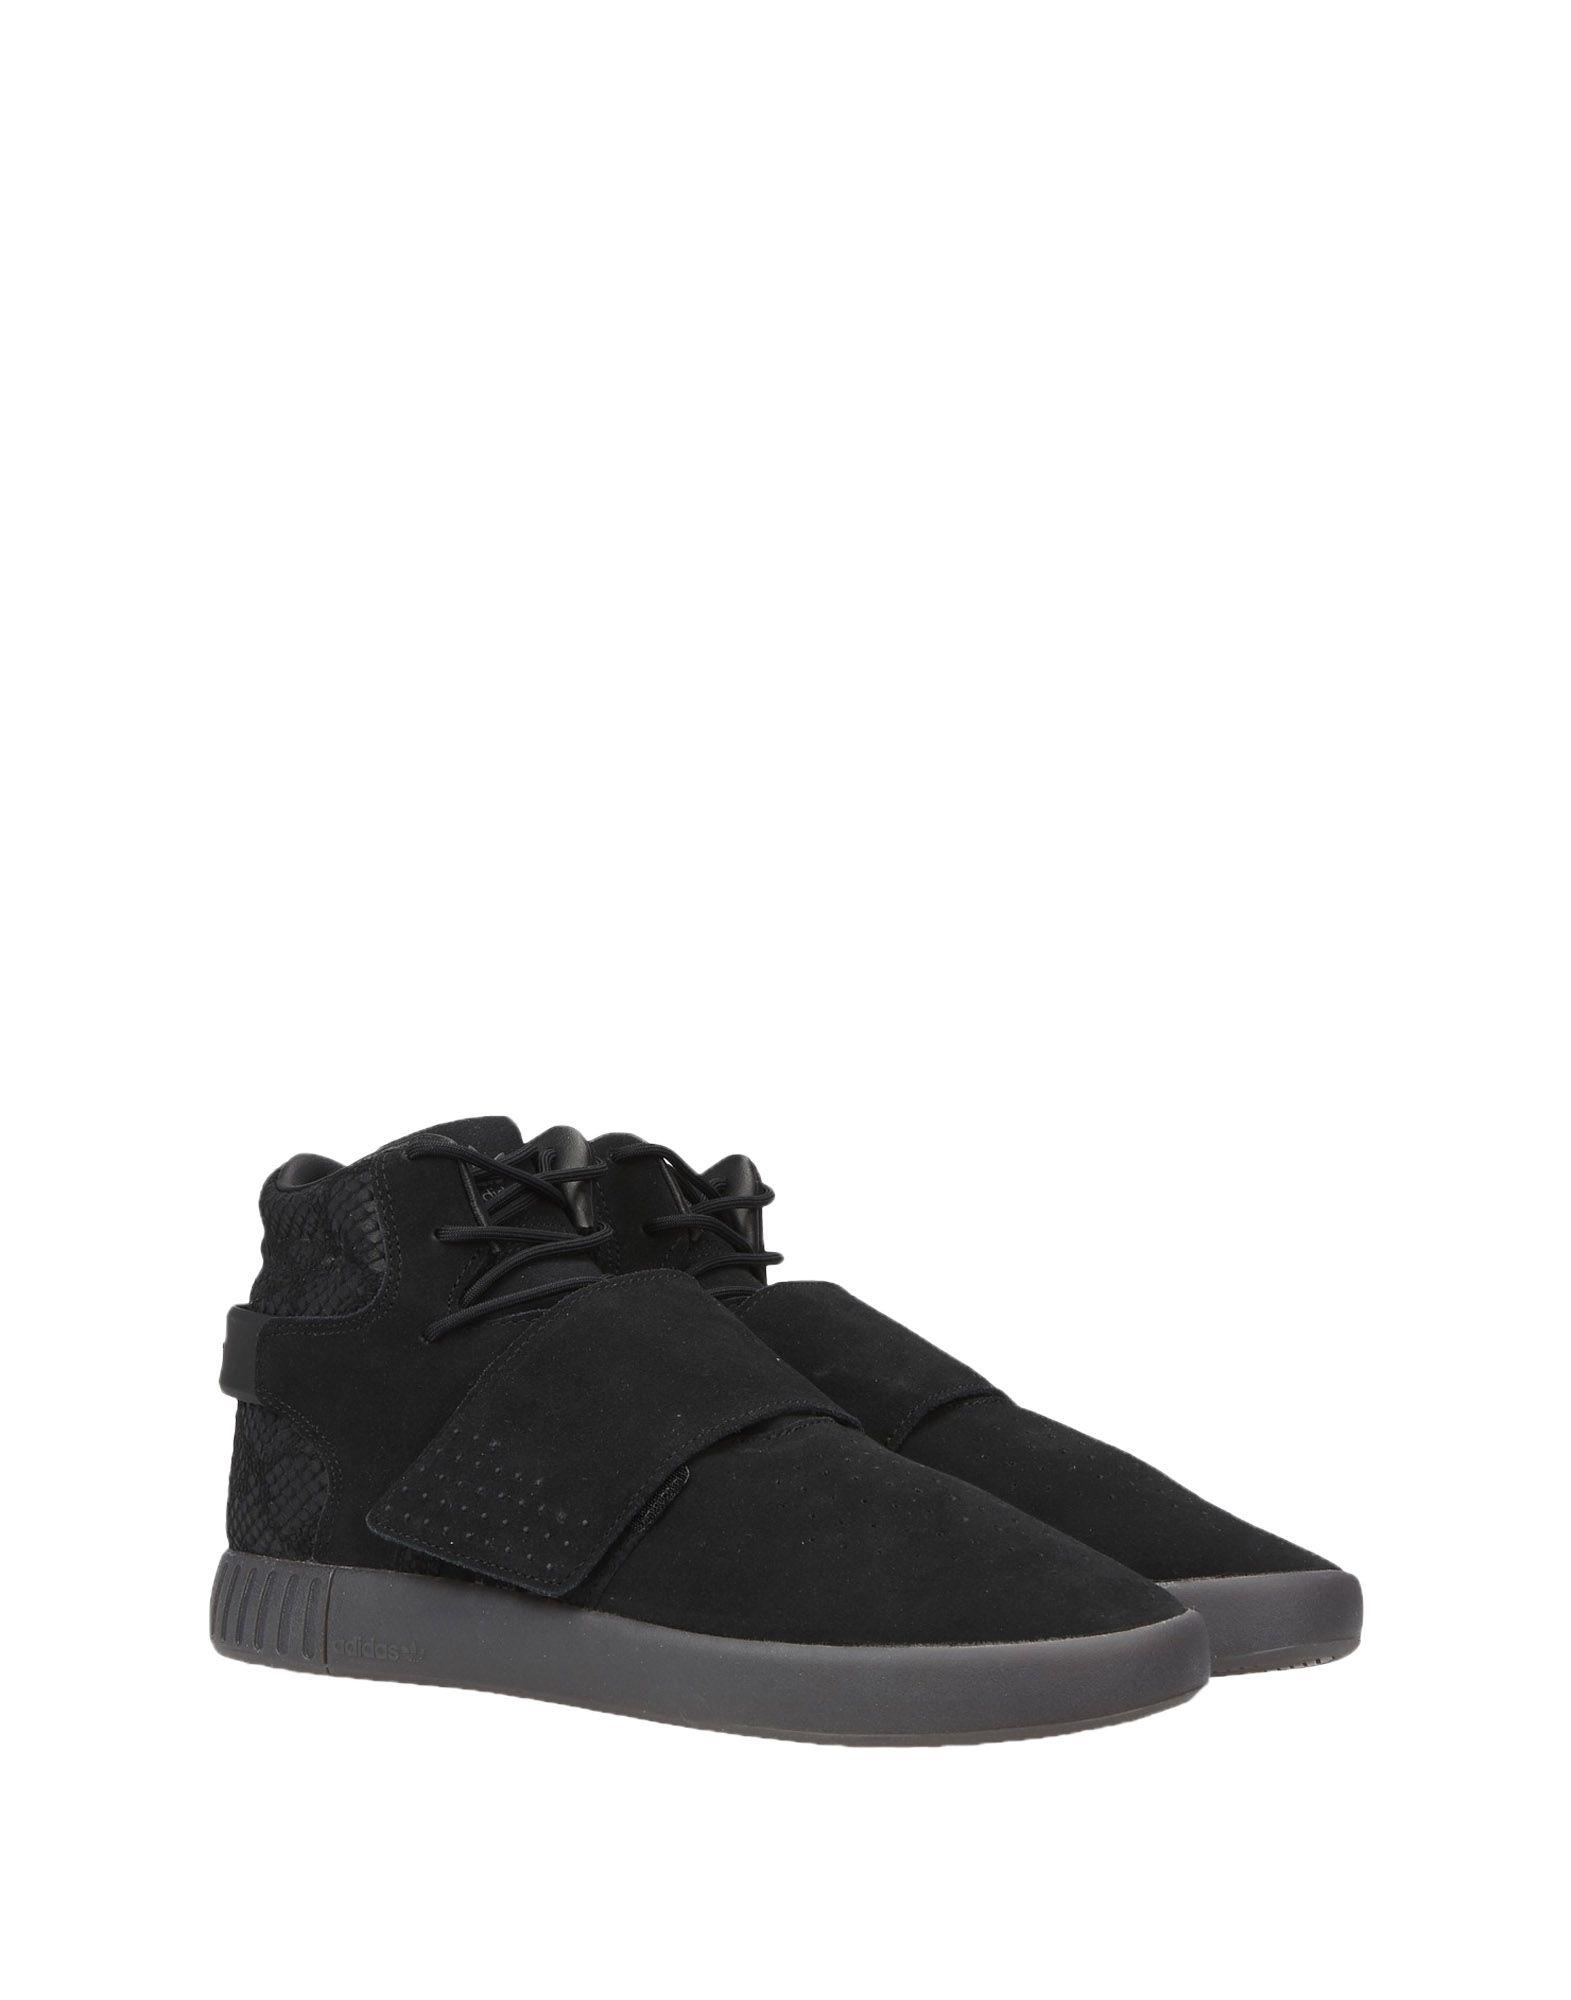 Sneakers Adidas Originals Tubular Invader Str - Homme - Sneakers Adidas Originals sur